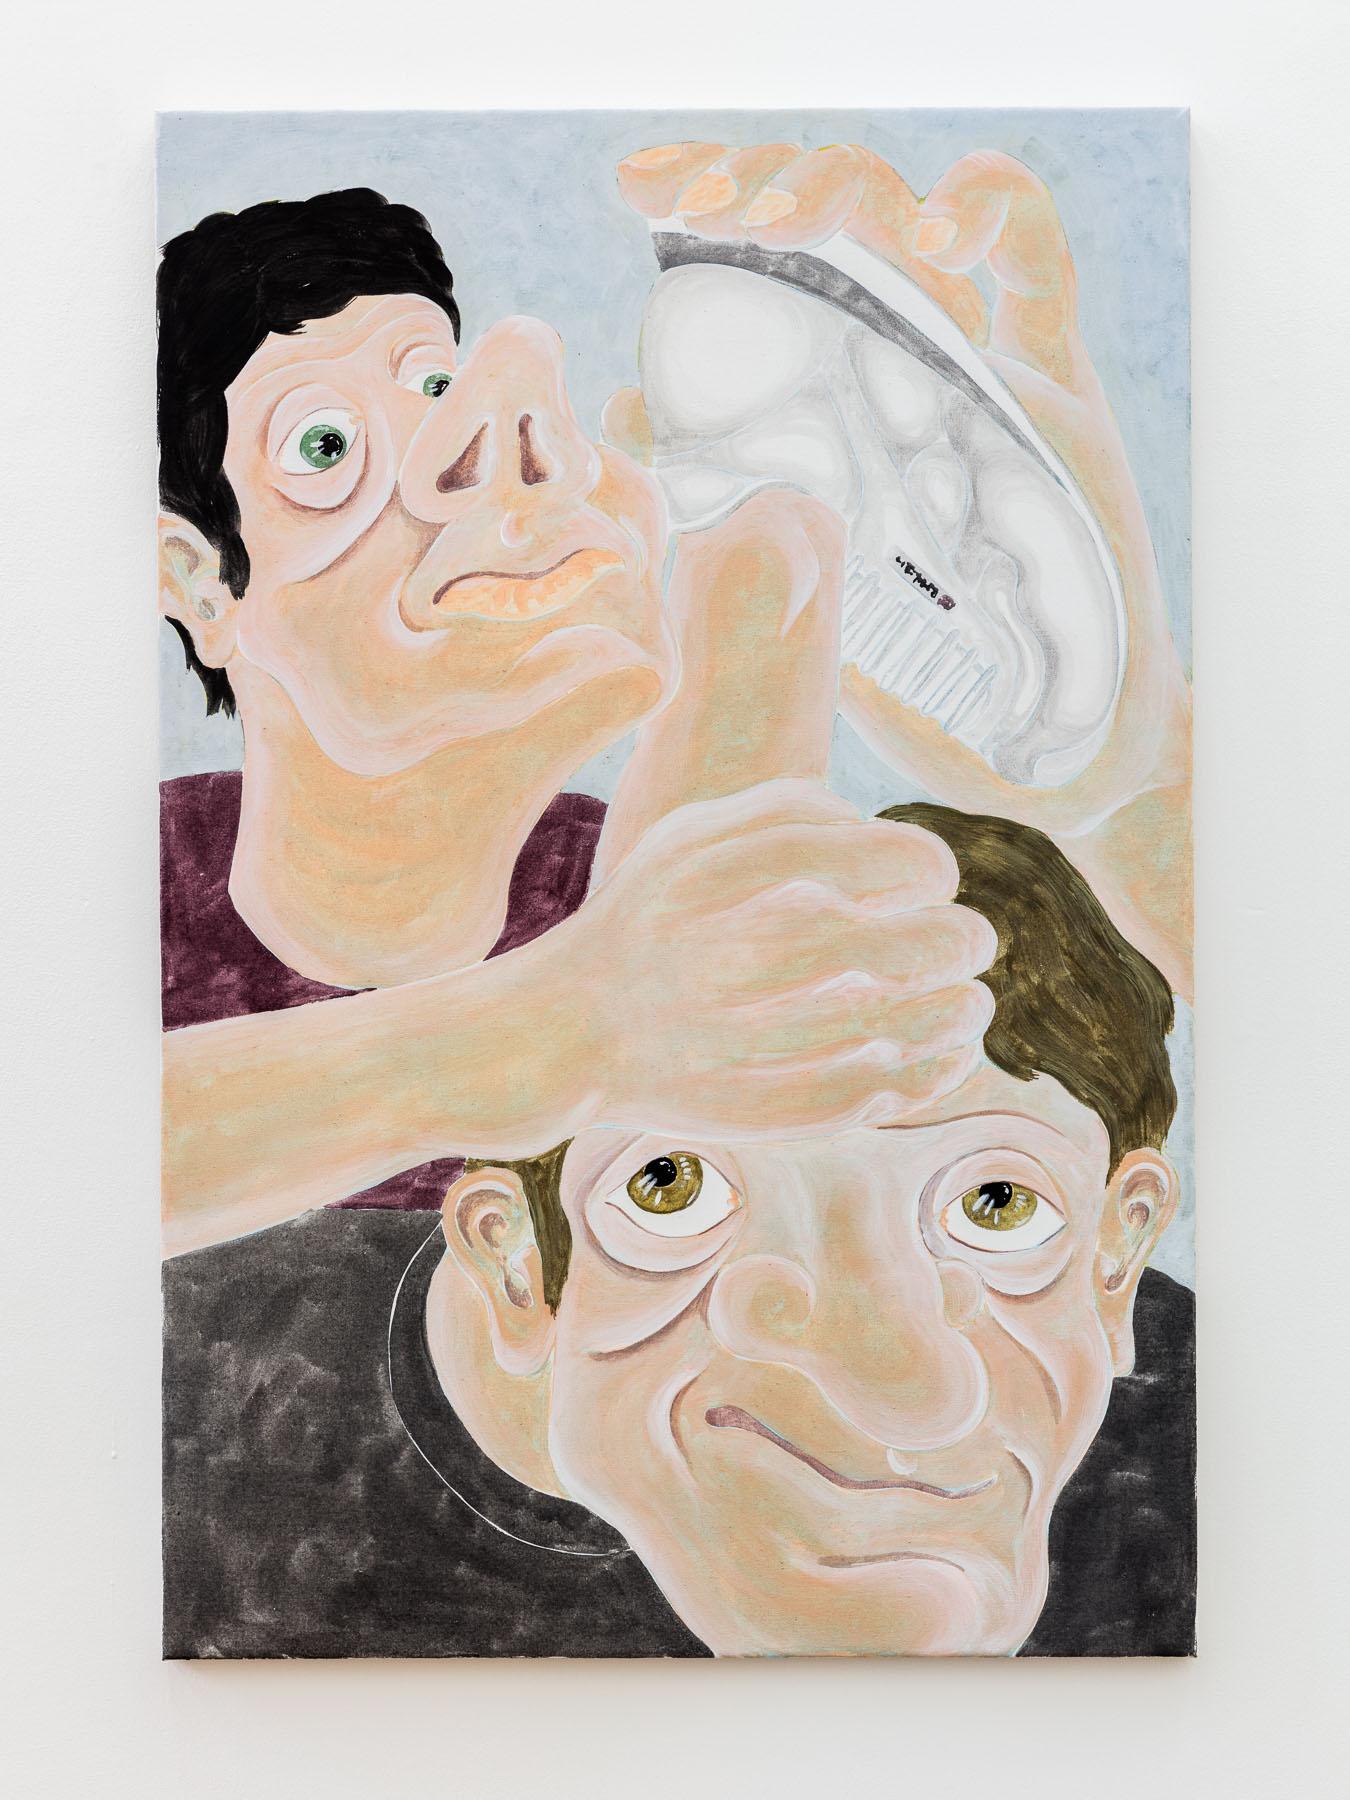 Stefan Fuchs, Mental, 2017, Acrylic and watercolor pencil on canvas, 90 x 60 cm